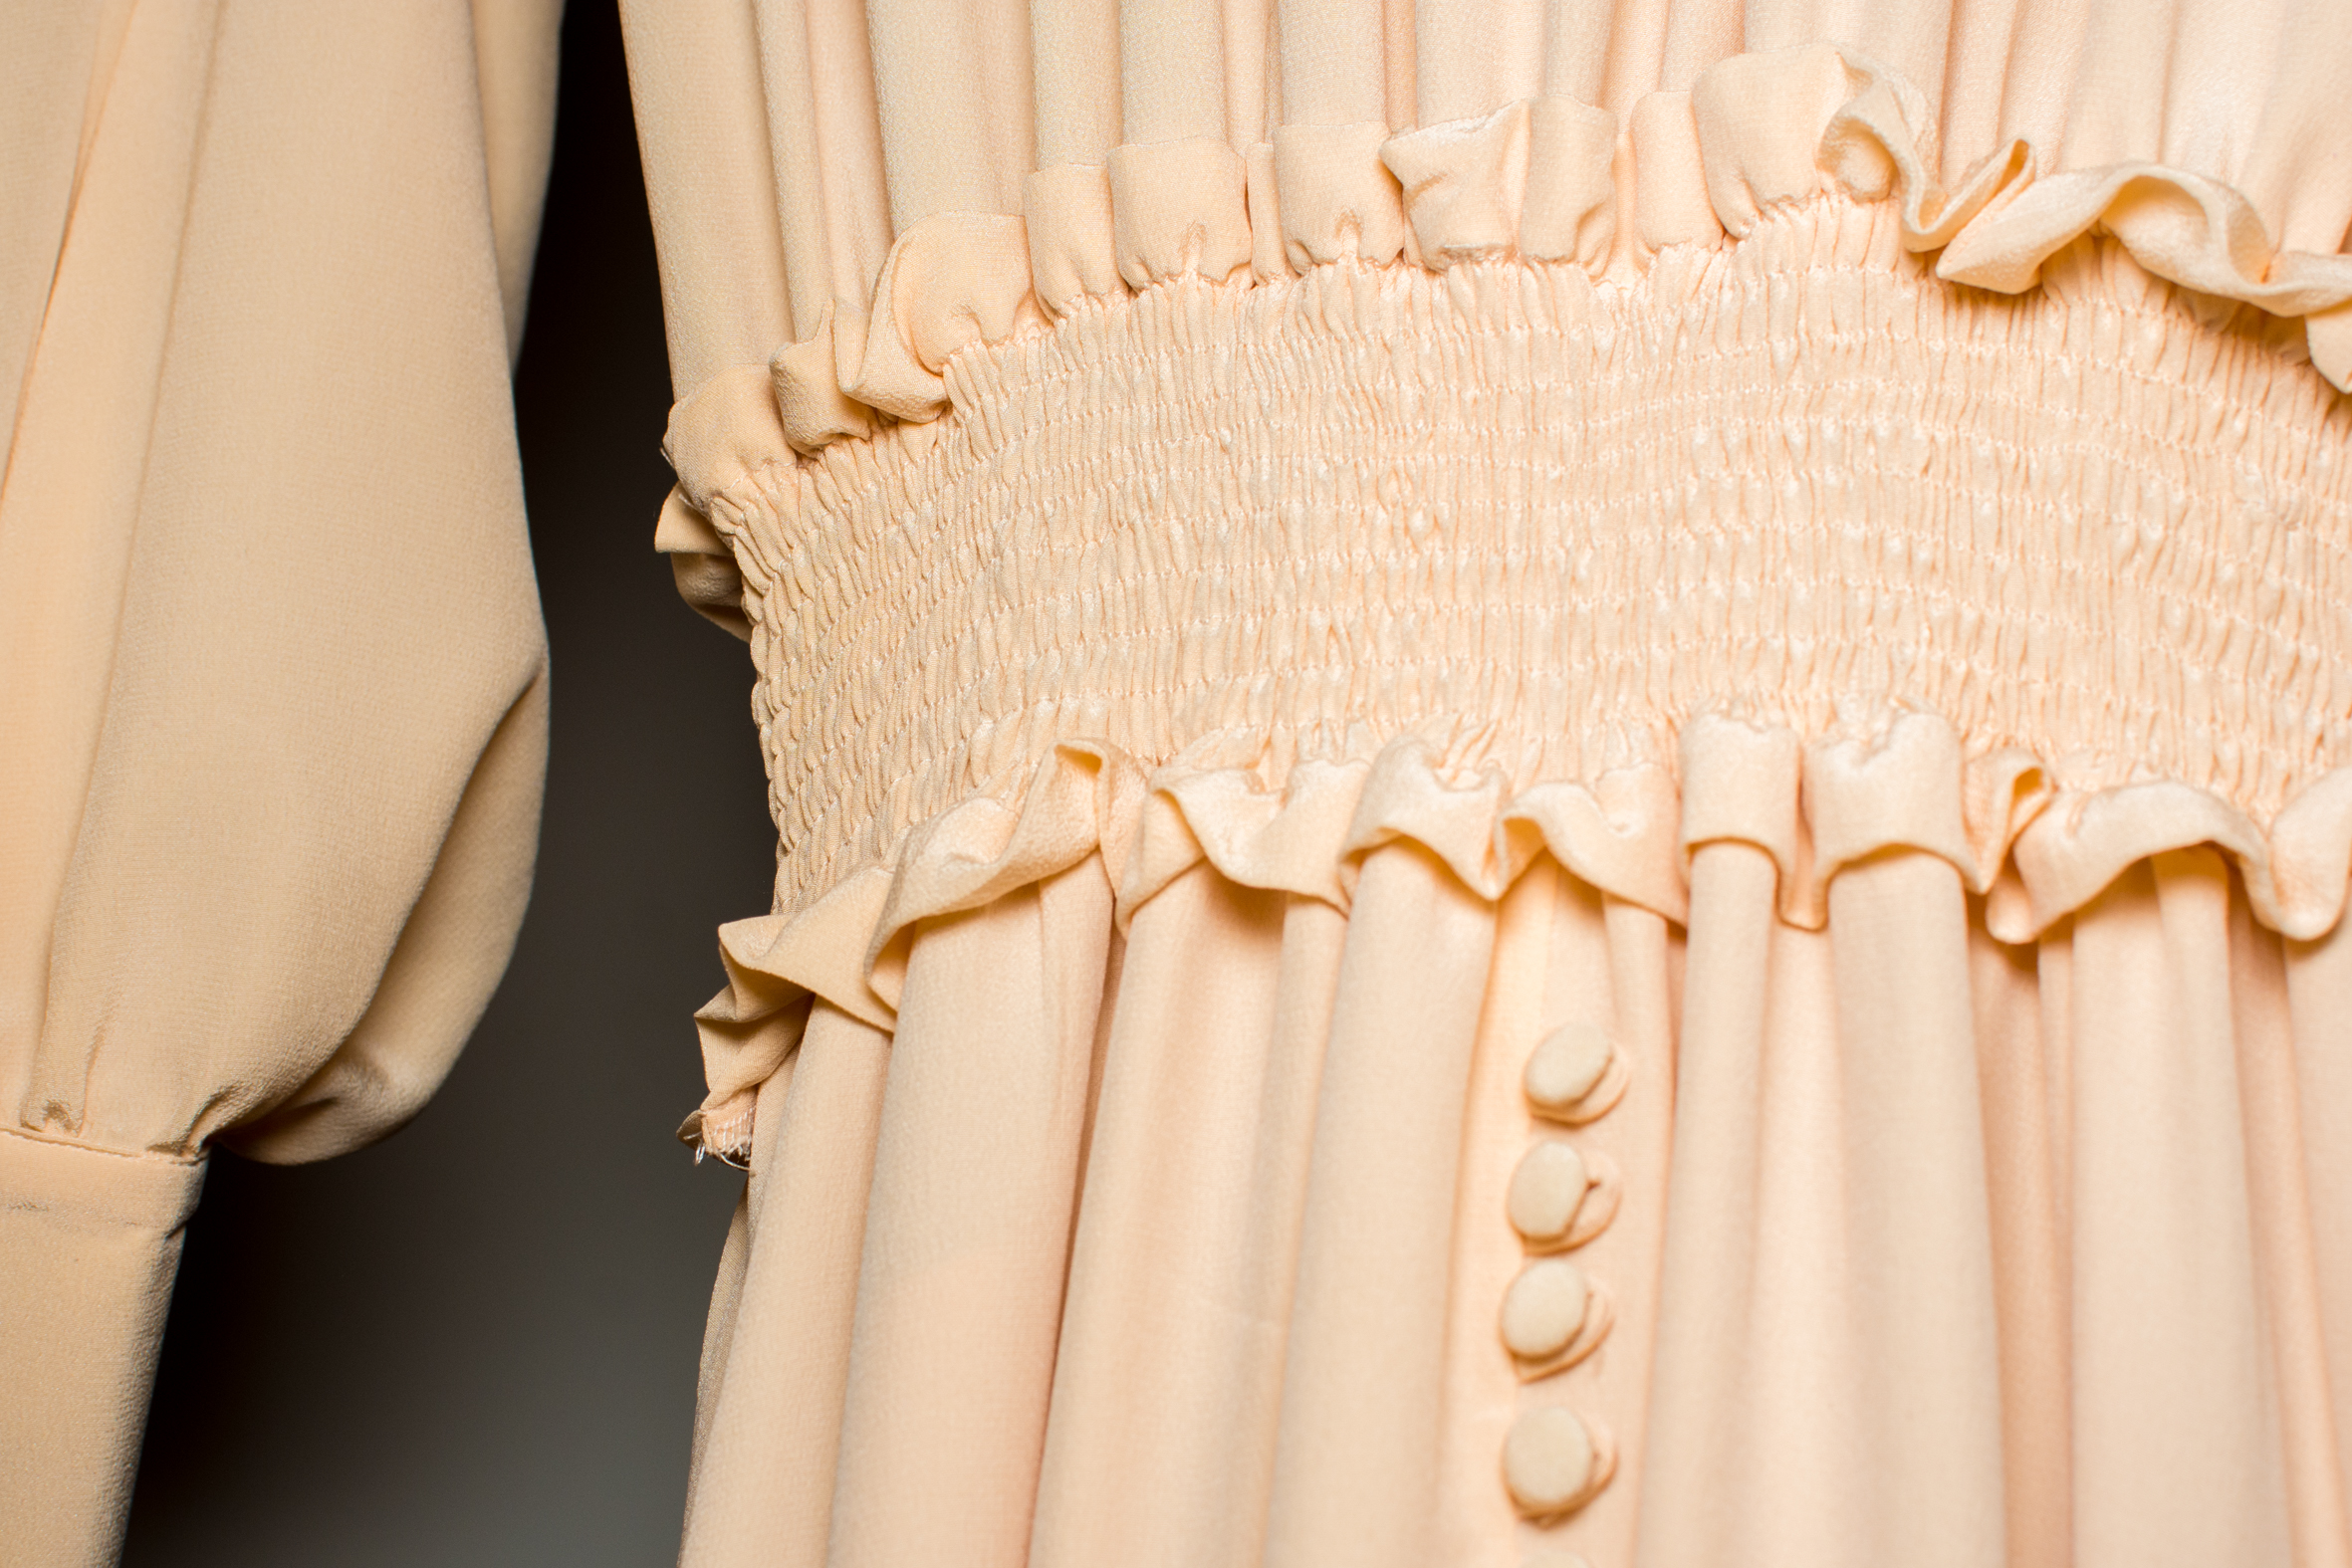 Detaljbilde kjole